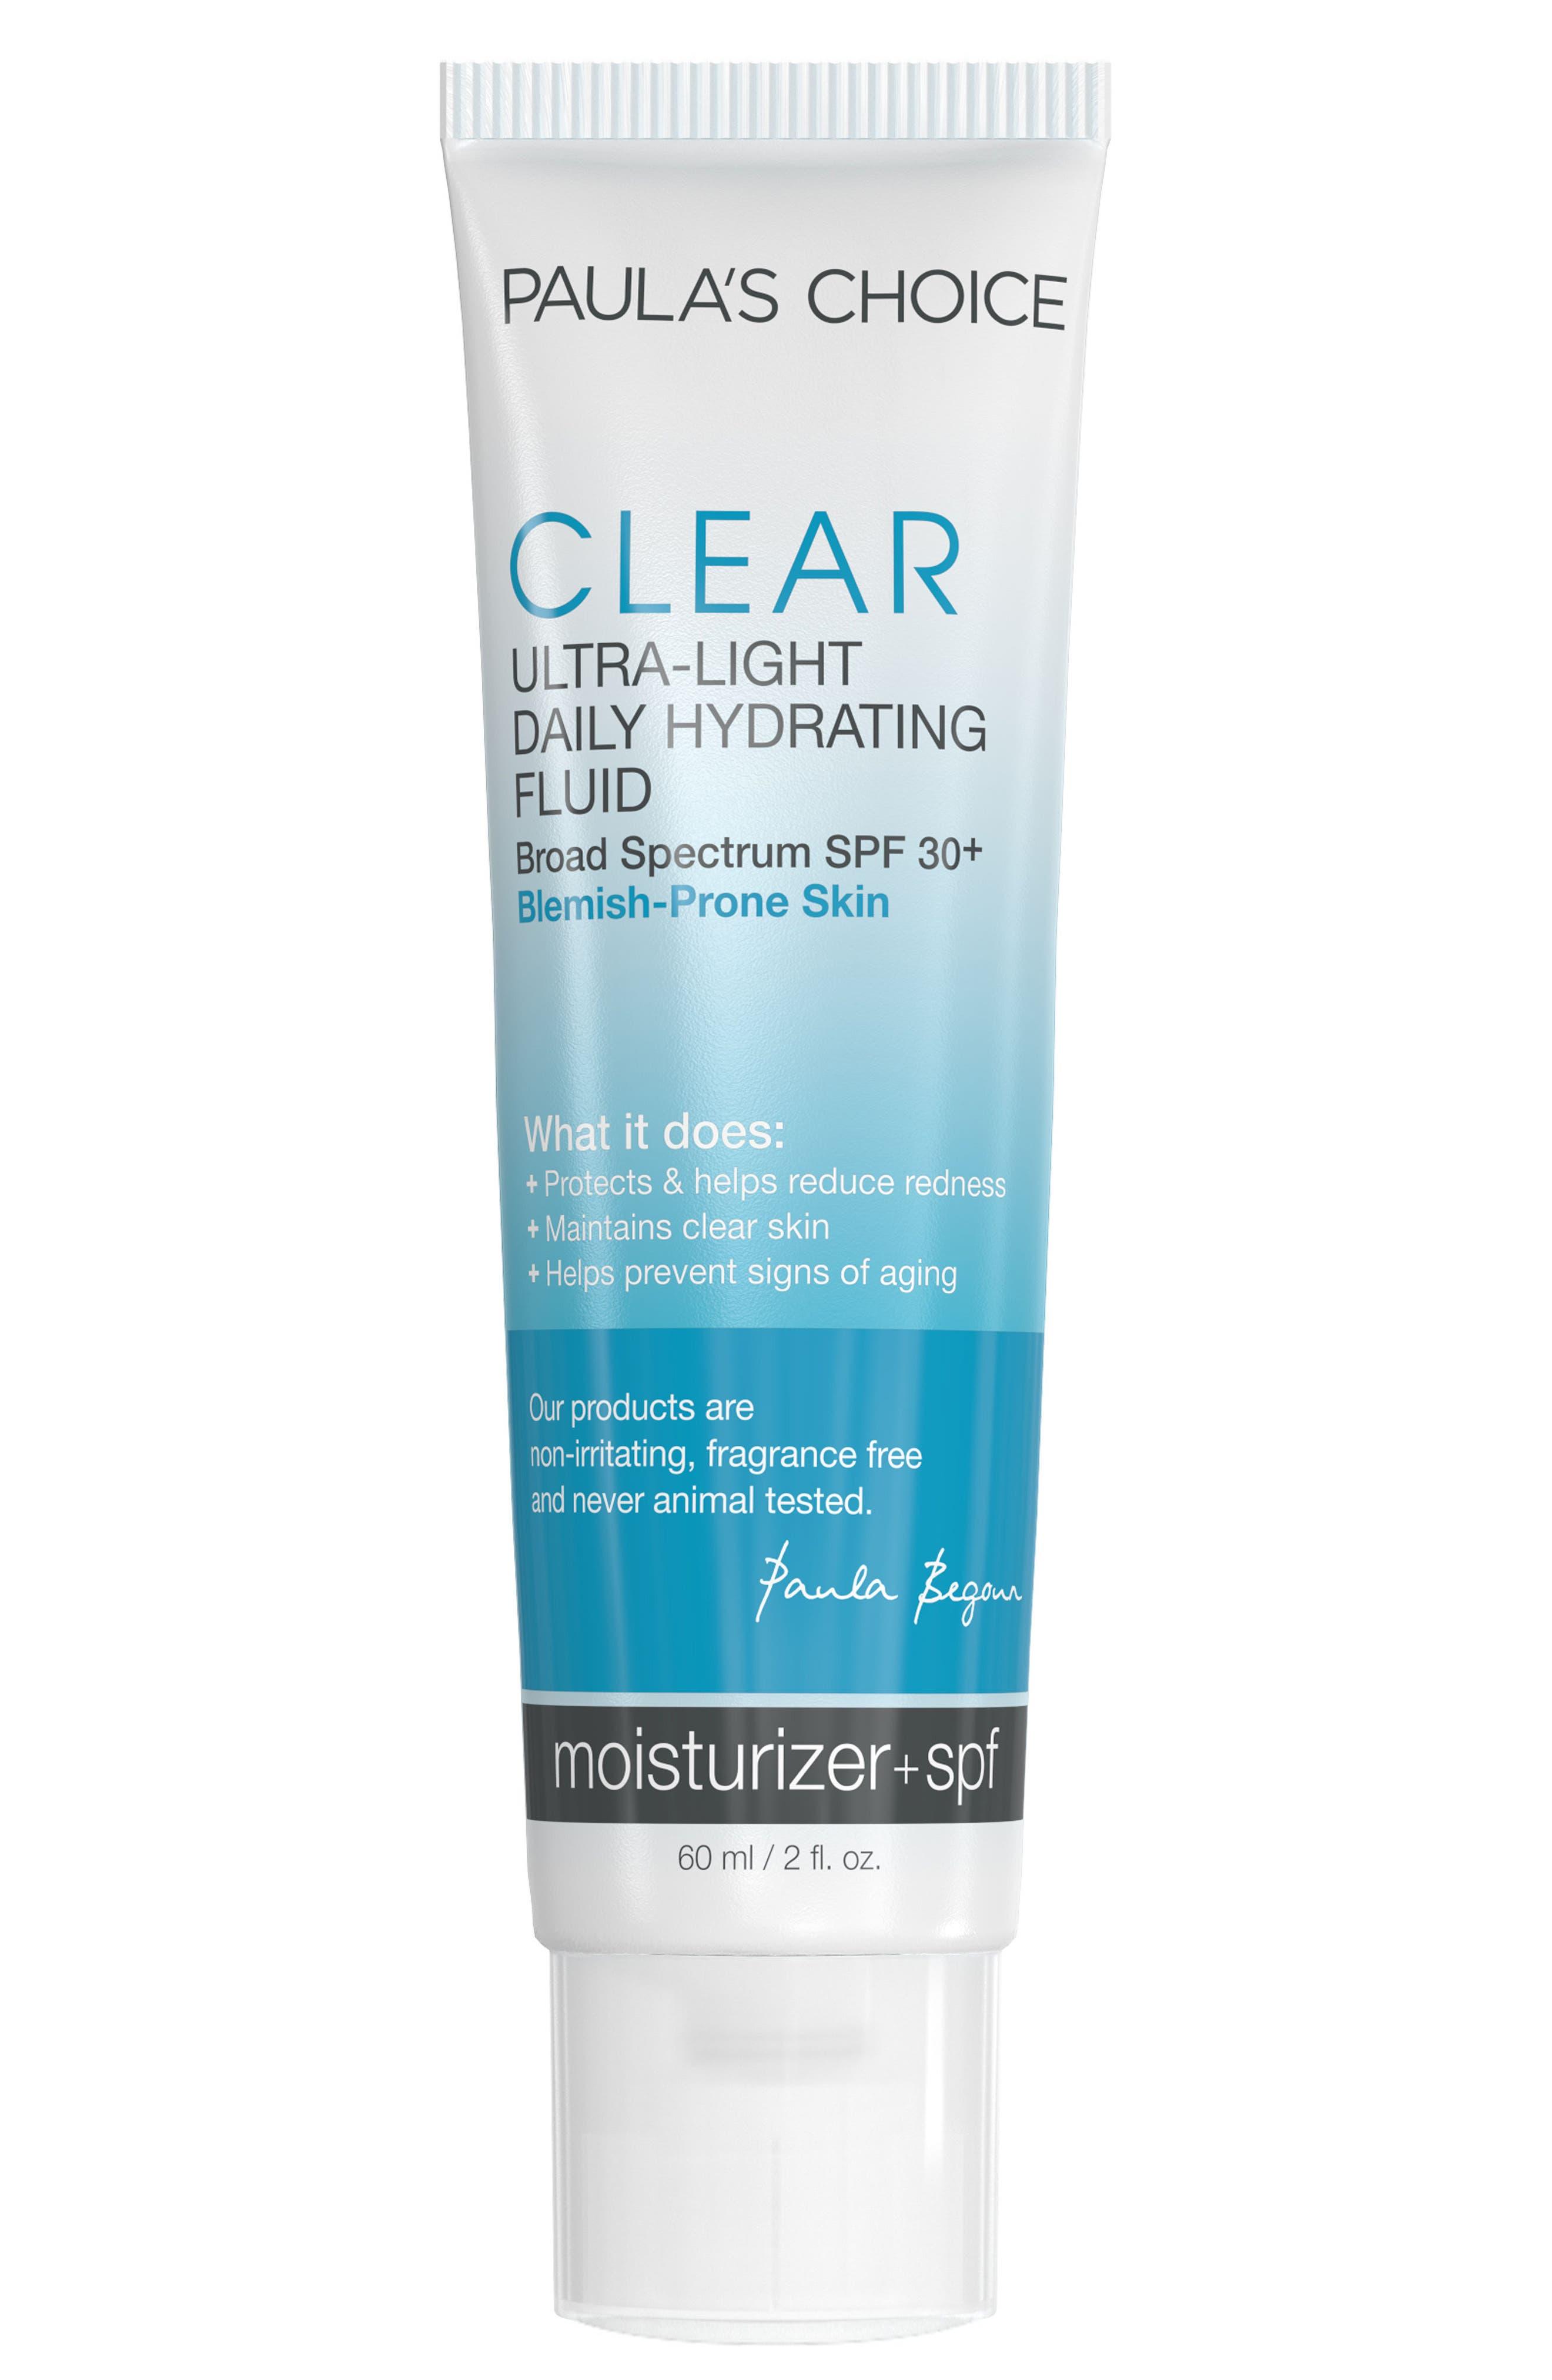 Paula's Choice Clear Ultra-Light Daily Mattifying Fluid SPF 30+